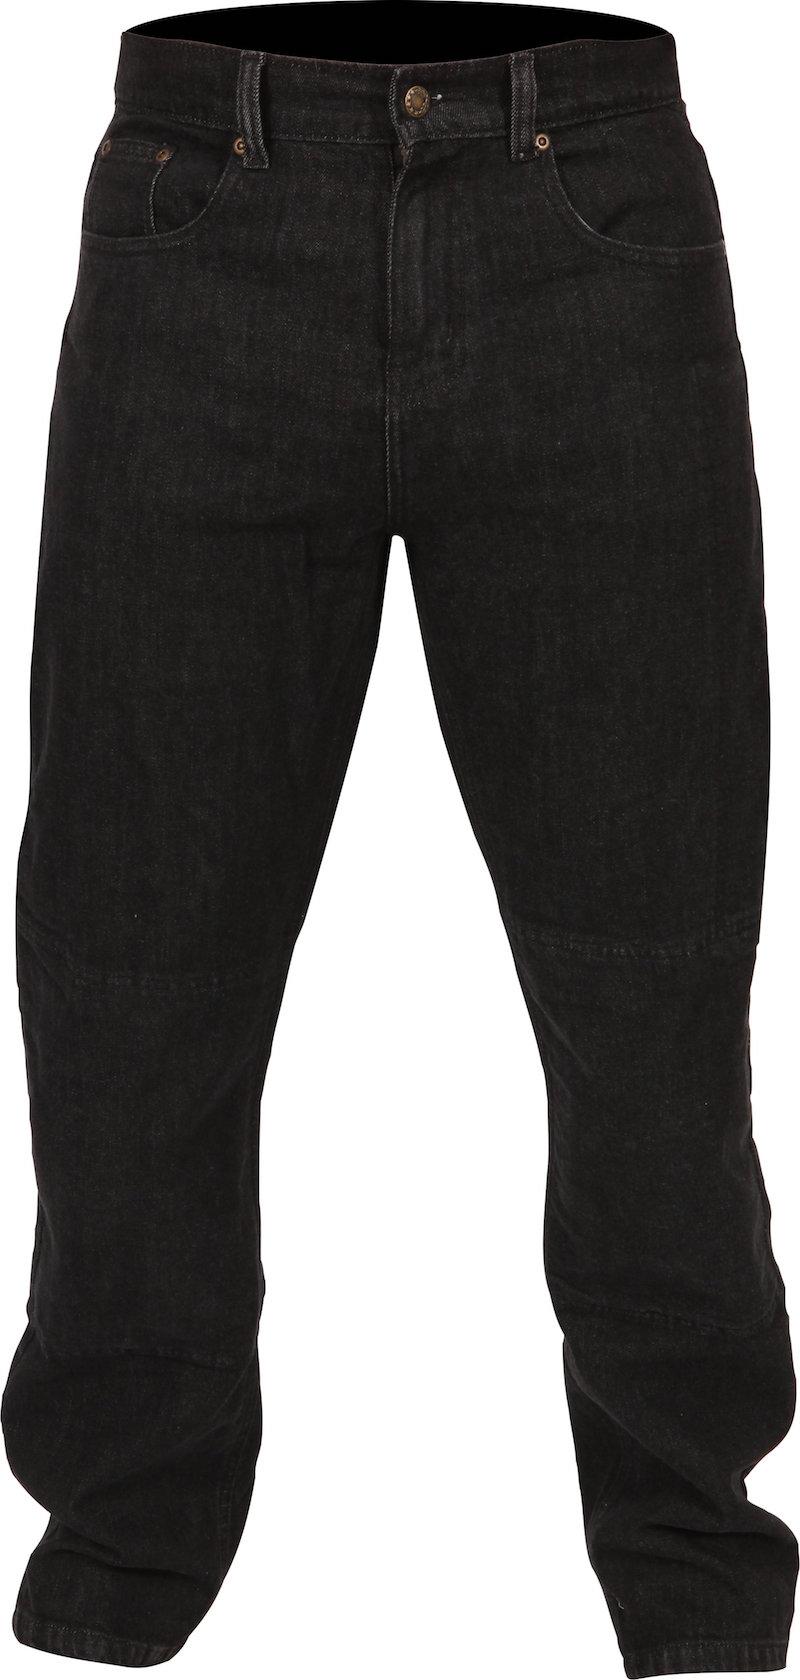 Weise Boston Jeans